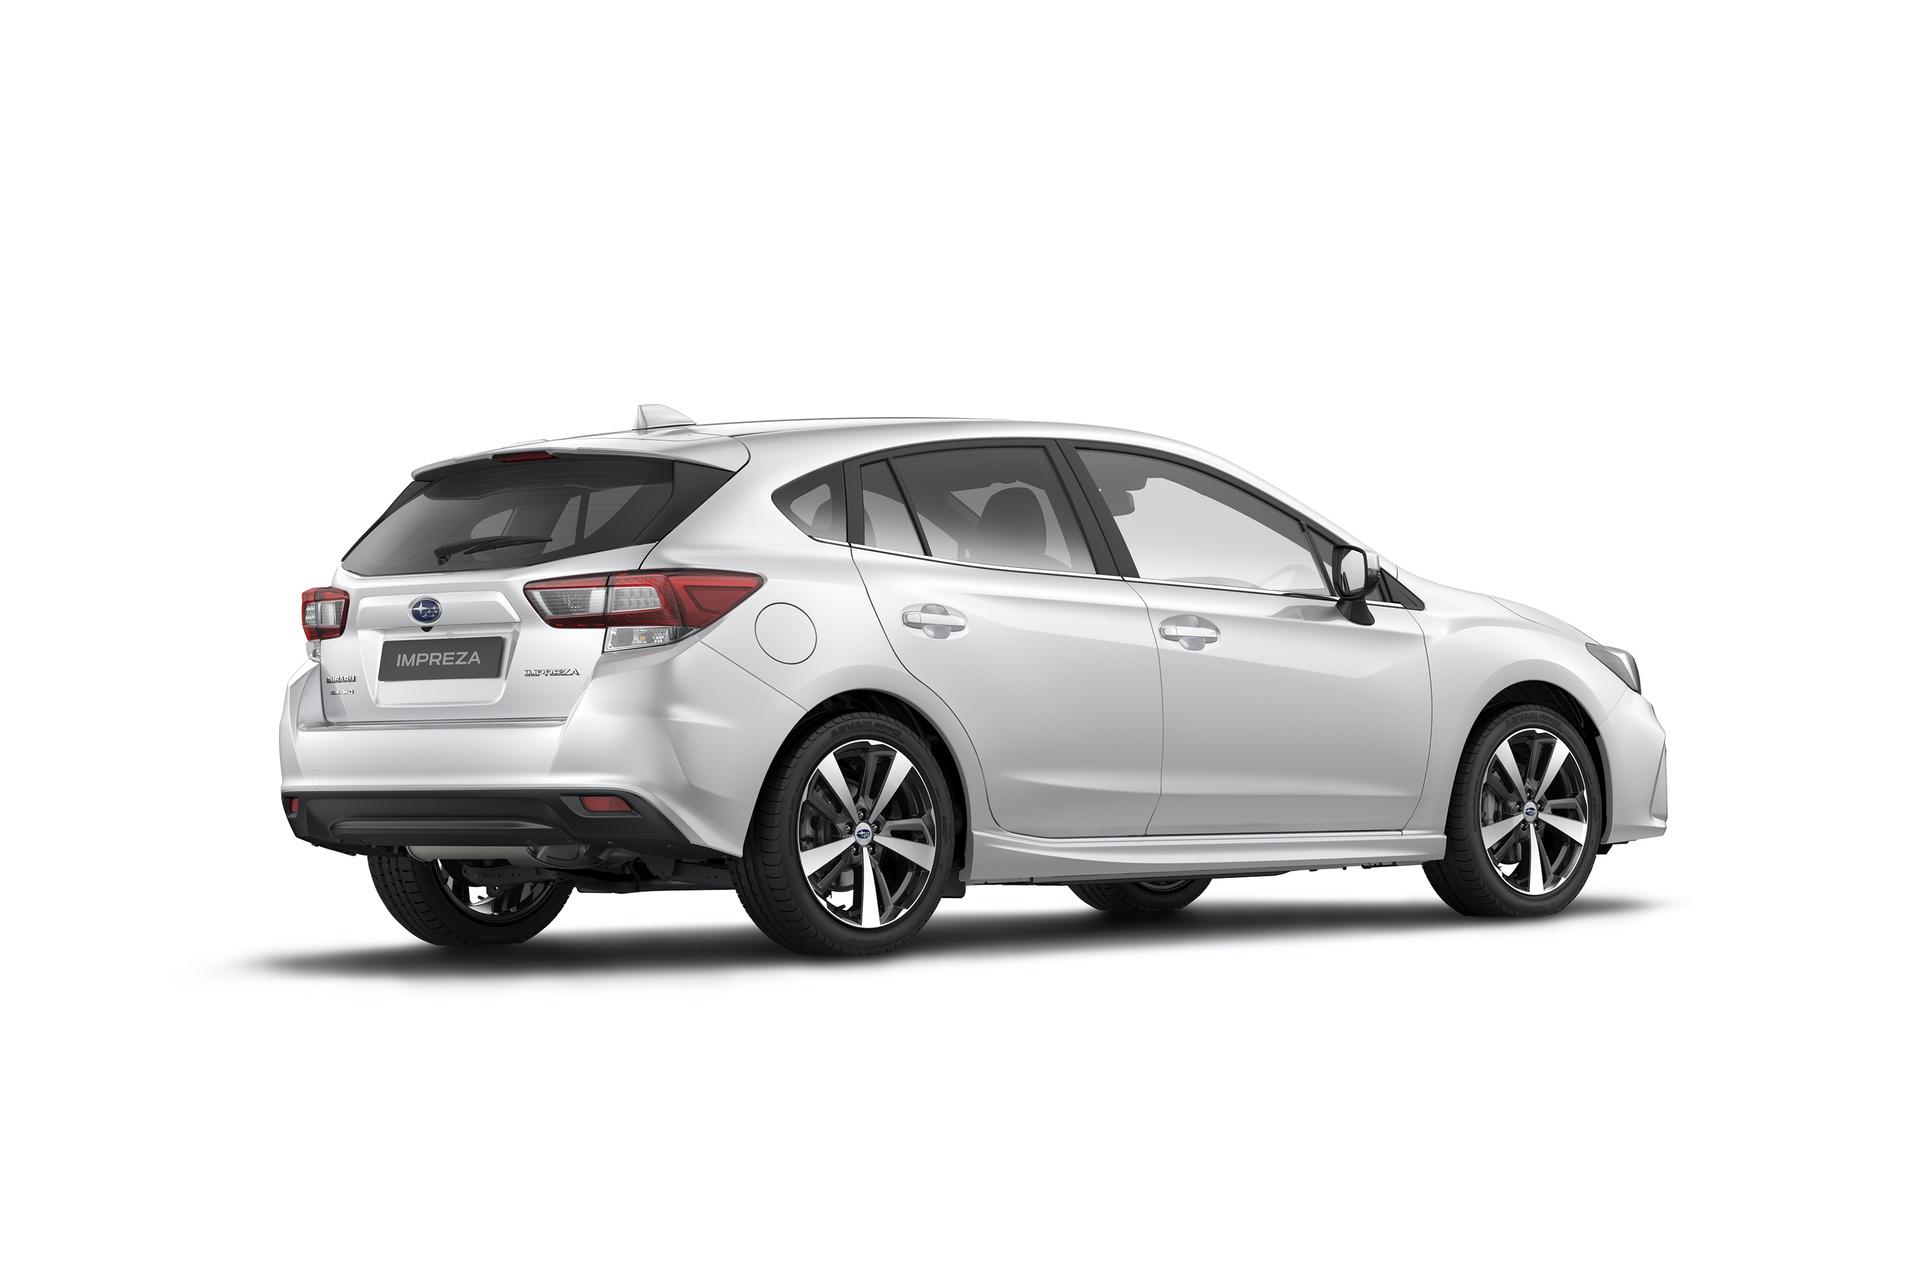 First_Drive_Subaru_Impreza_0011